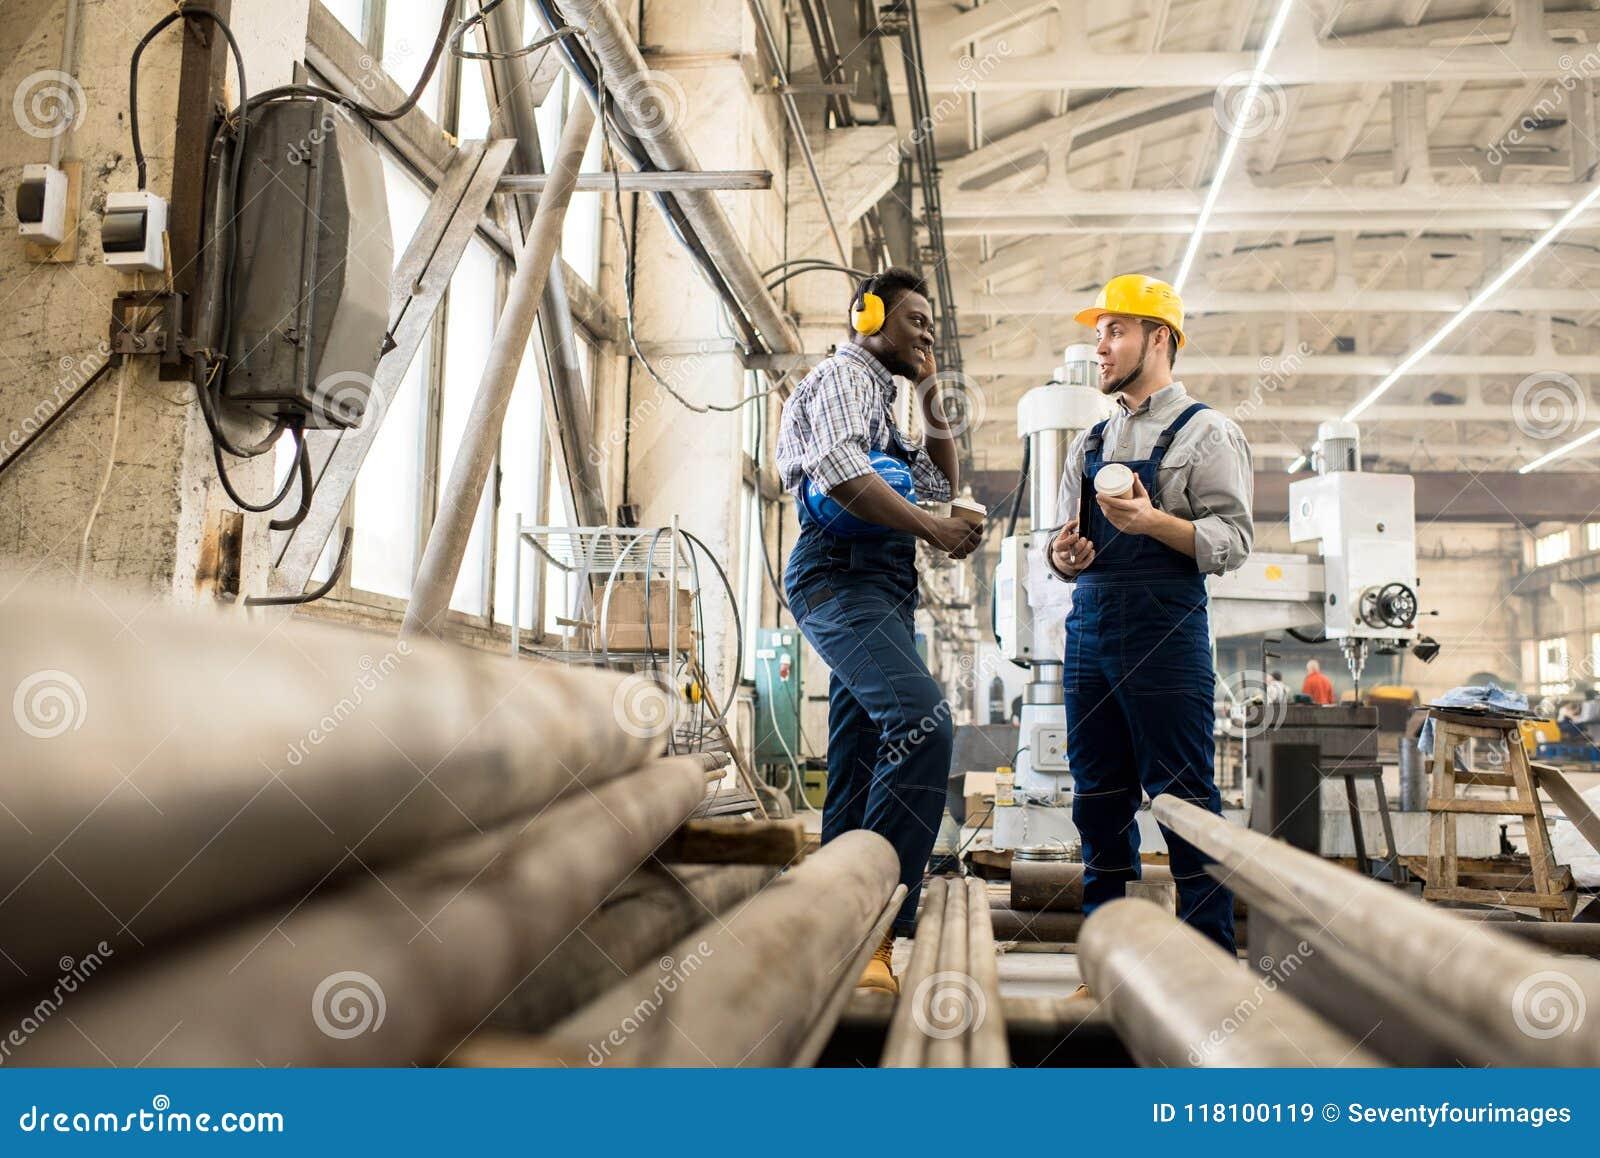 Take Break Coffeebreak : Taking coffee break from work stock image image of operator